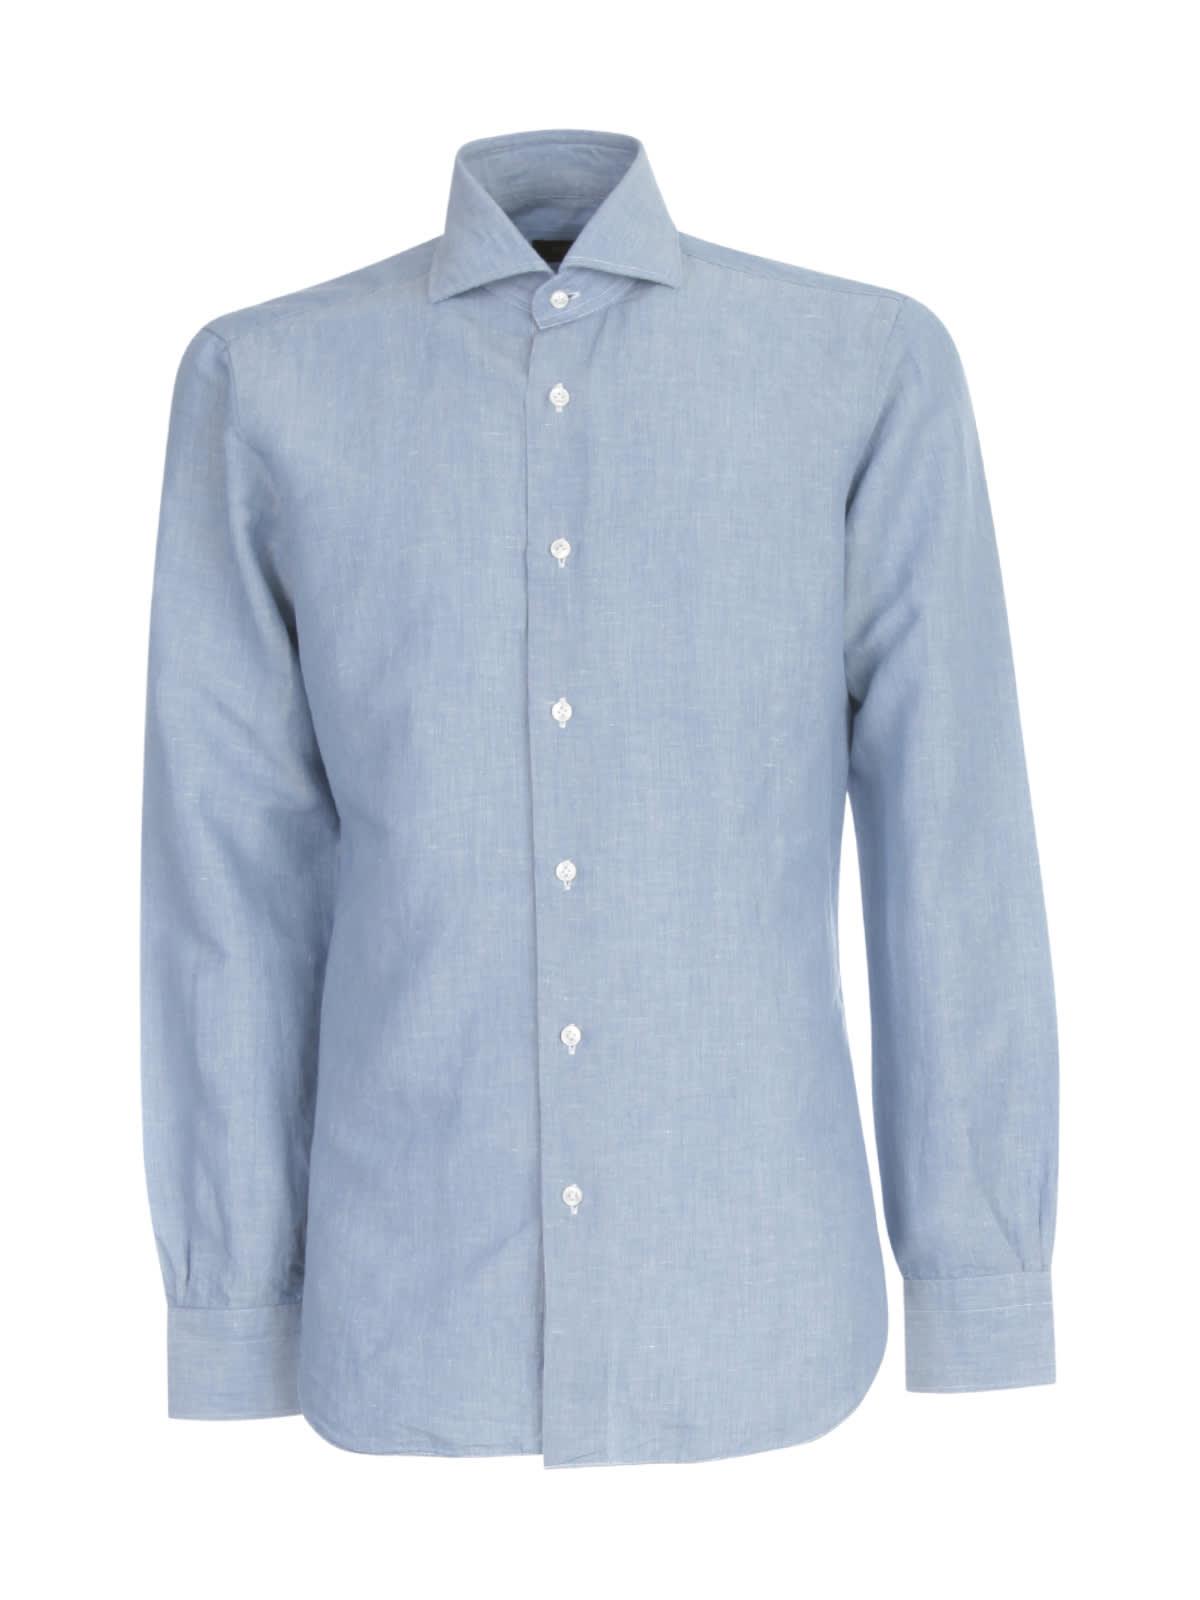 Shirt W/effect Denim On Neck